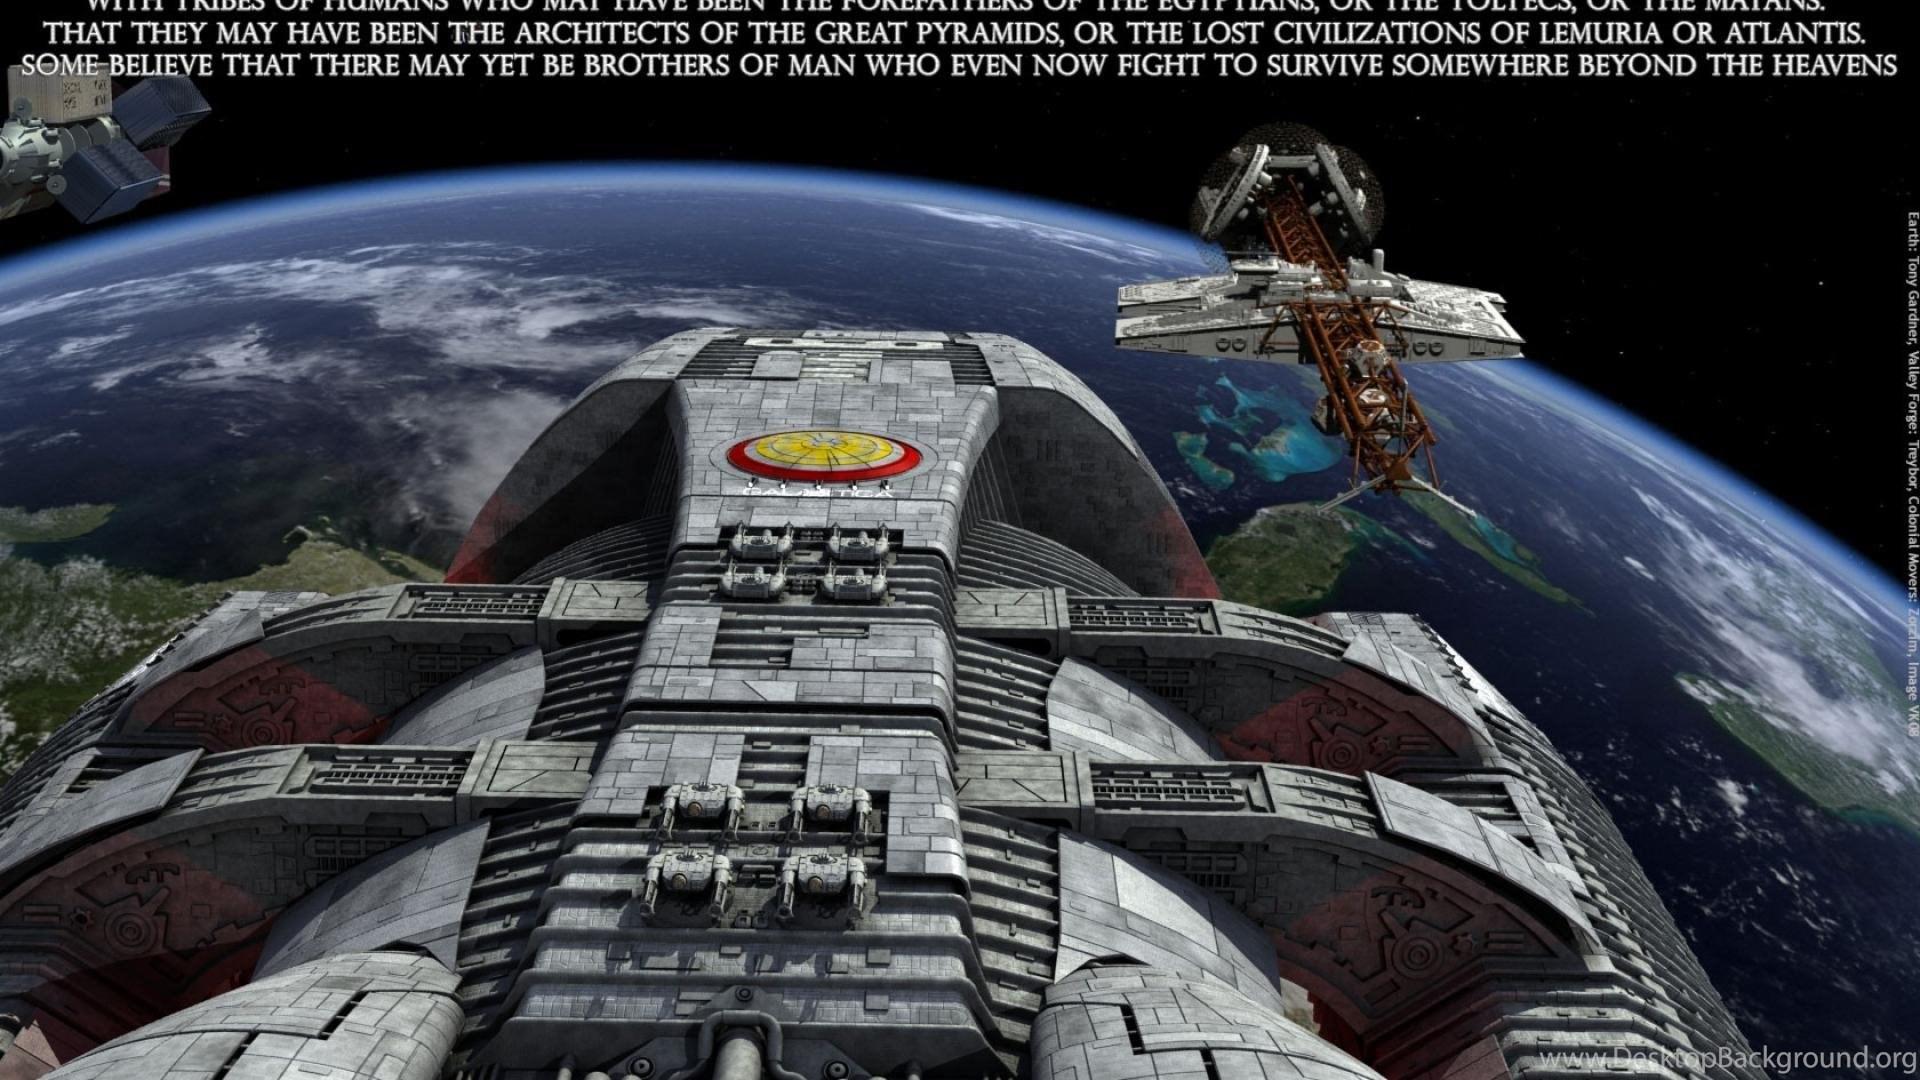 Battlestar Galactica Wallpapers Desktop Background